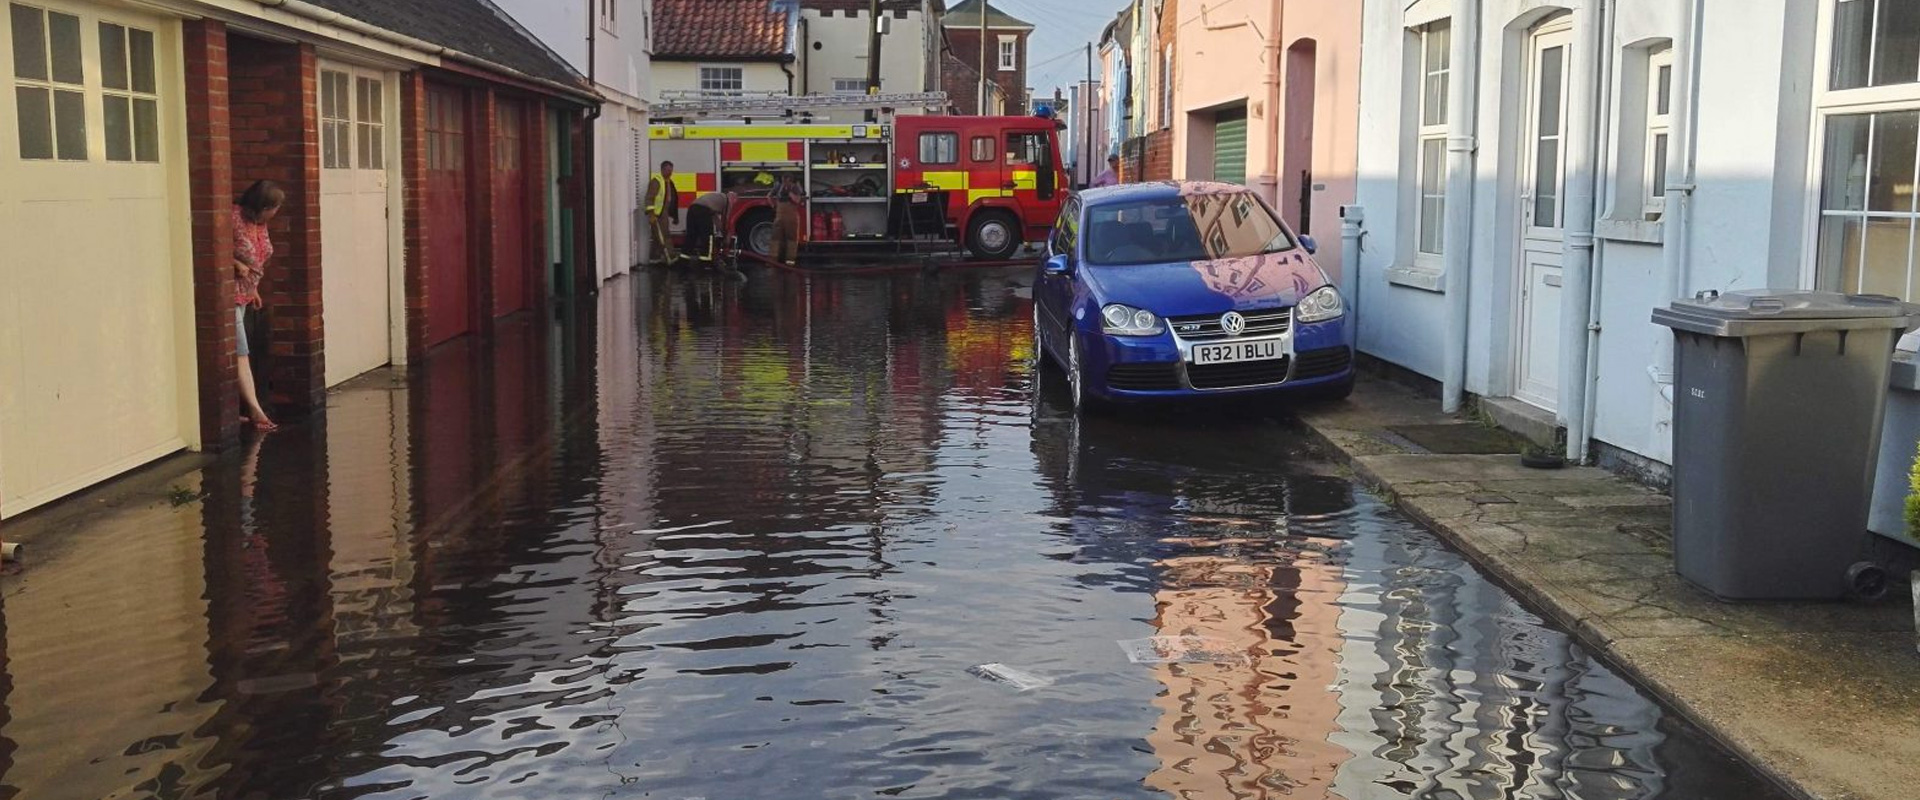 Warrior Fire & Rescue Service flood pumping